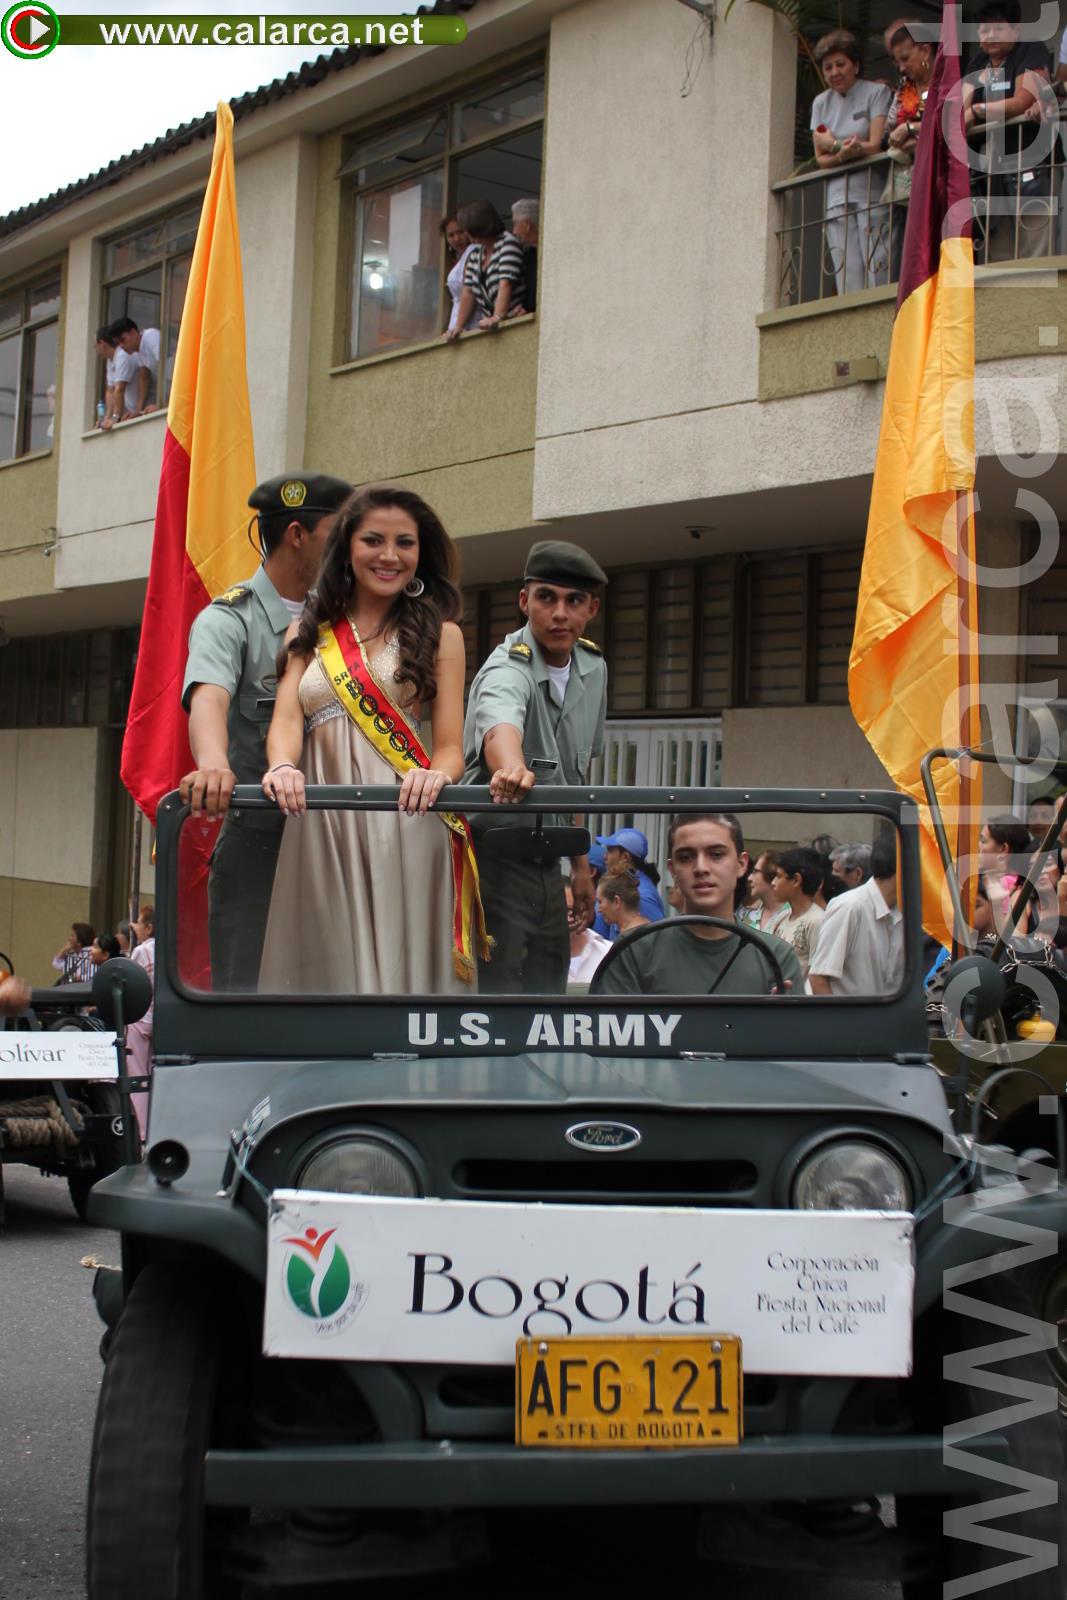 Bogotá D.C. - Angie Katherine Lancheros Tinoco